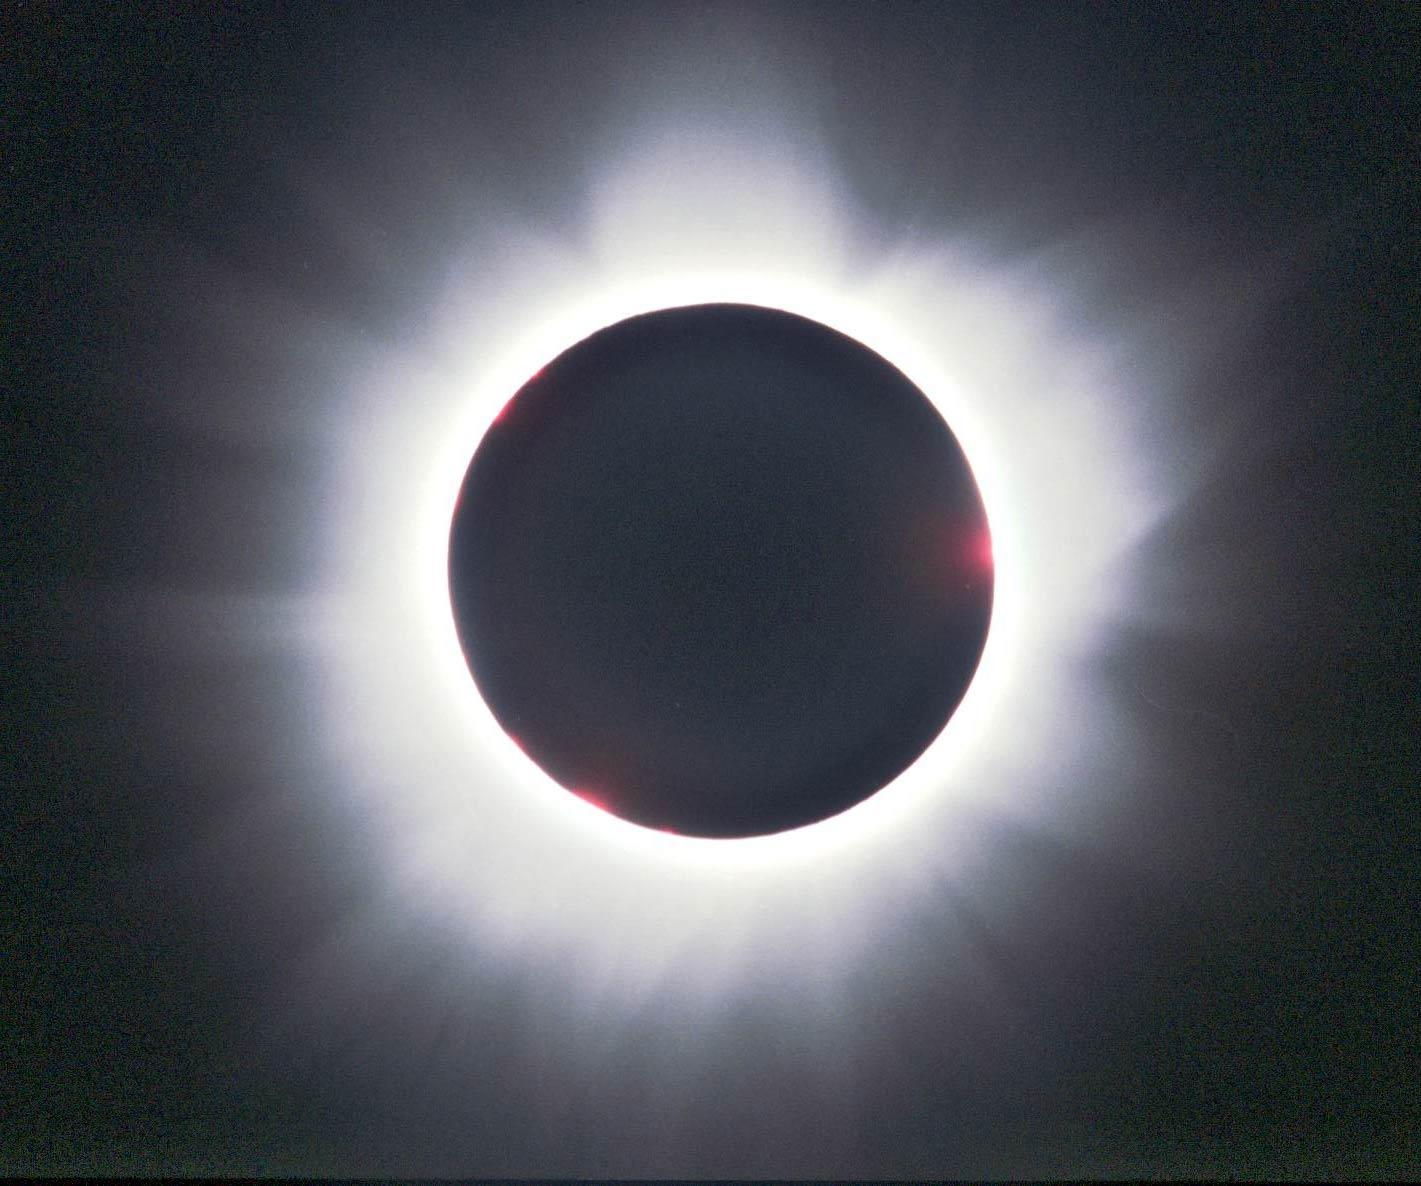 Sonnenfinsternis total